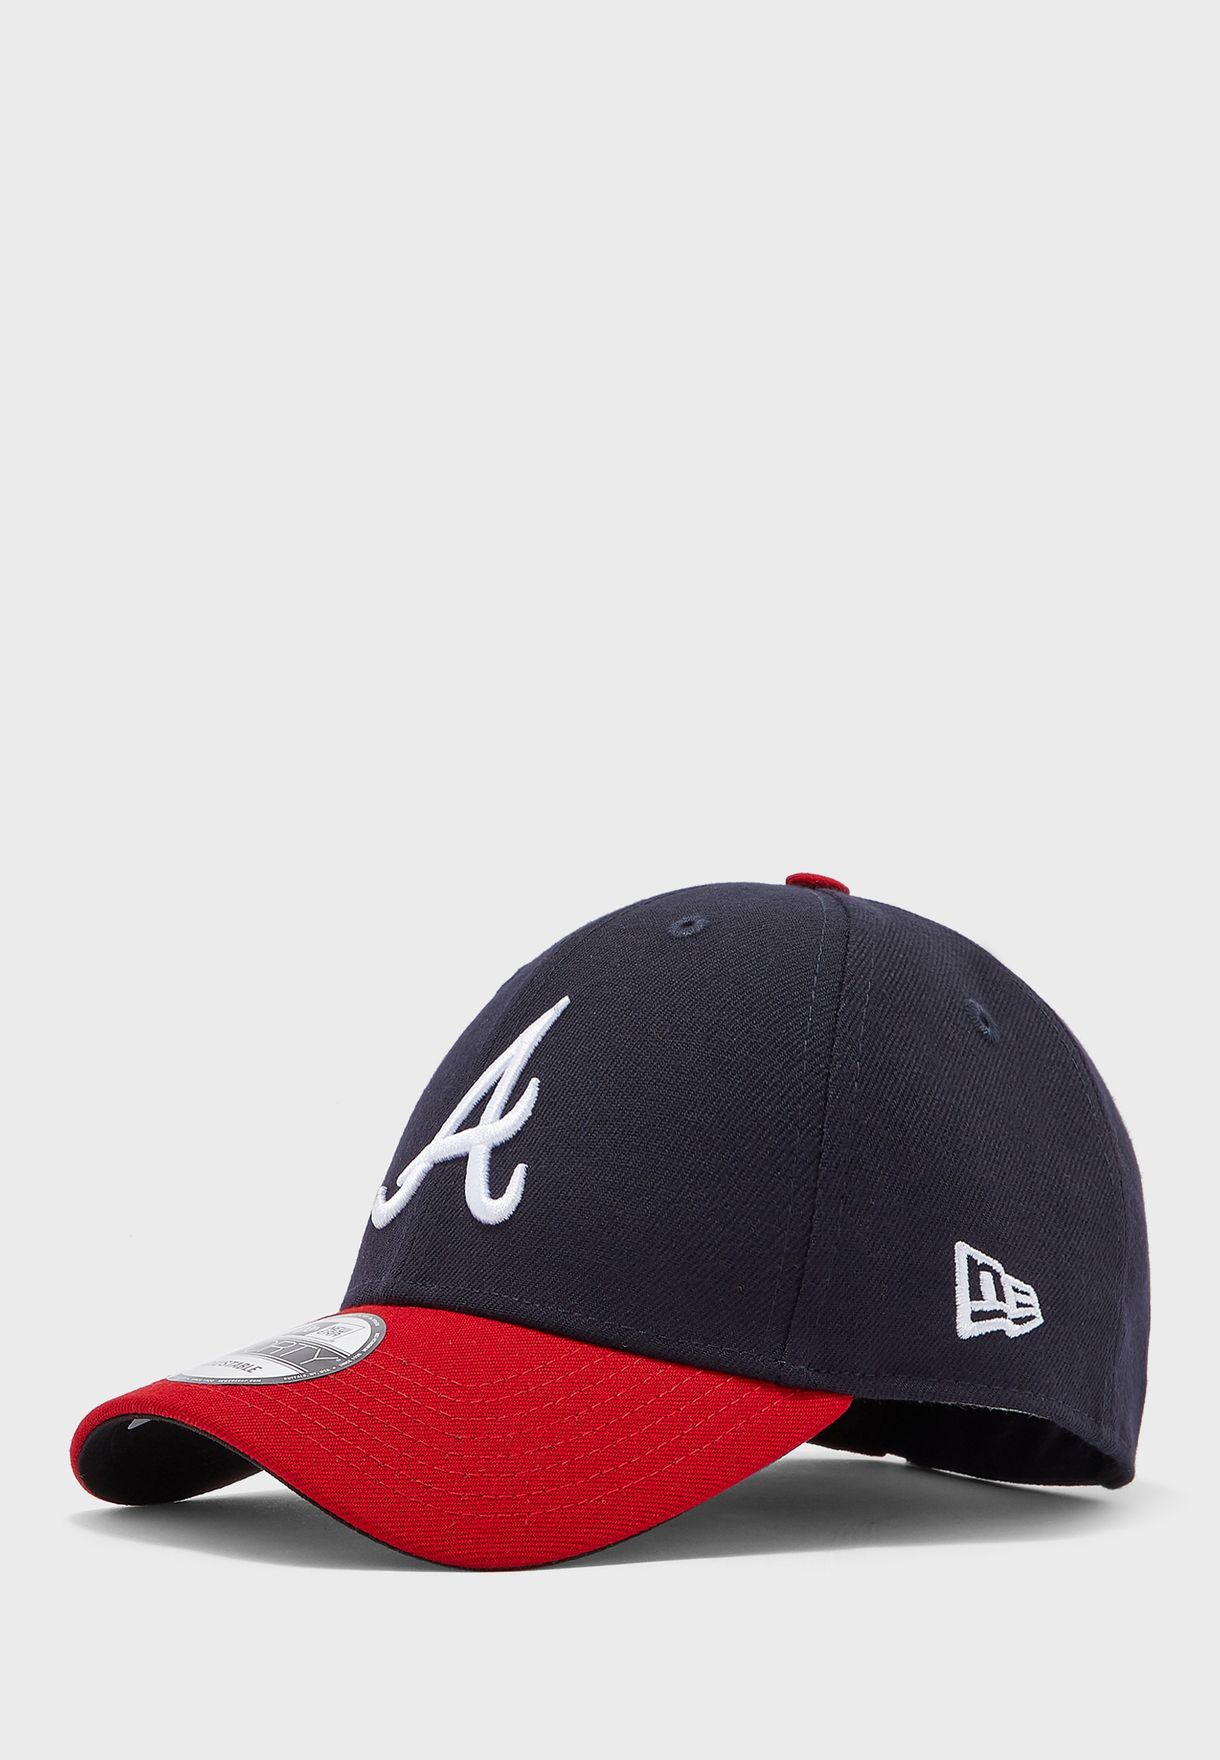 Atlanta Braves League Cap